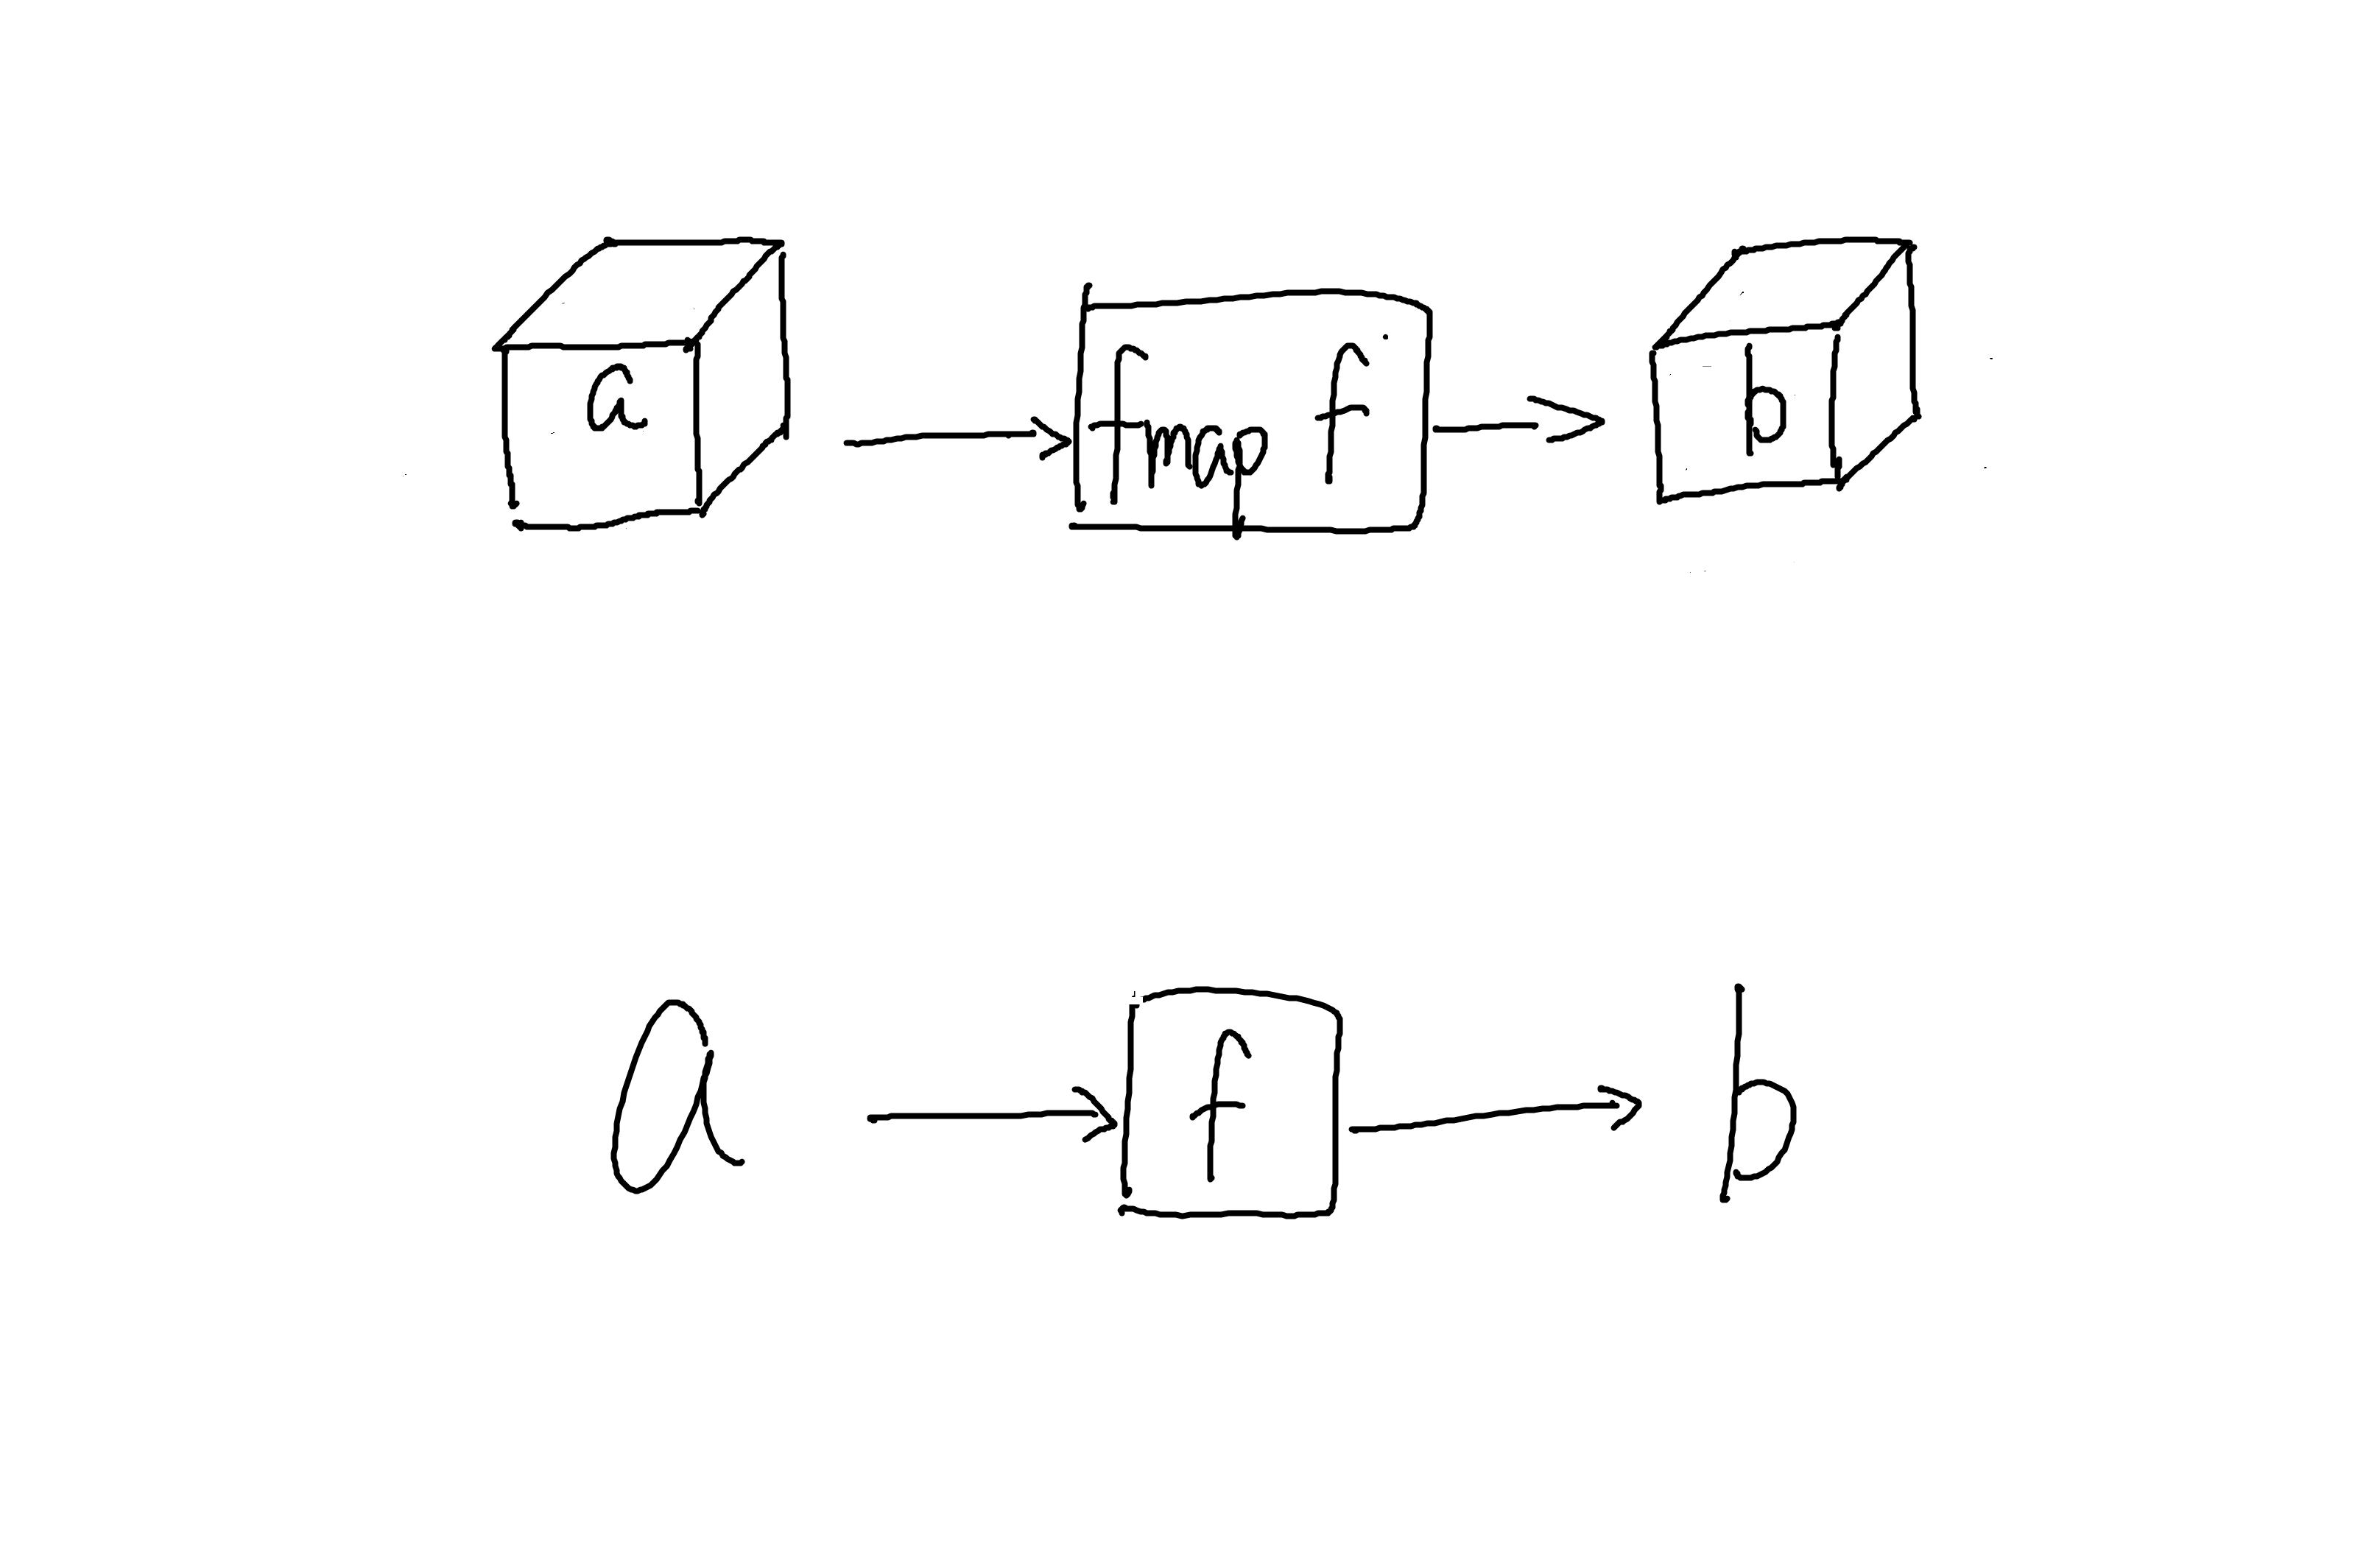 fmap.png